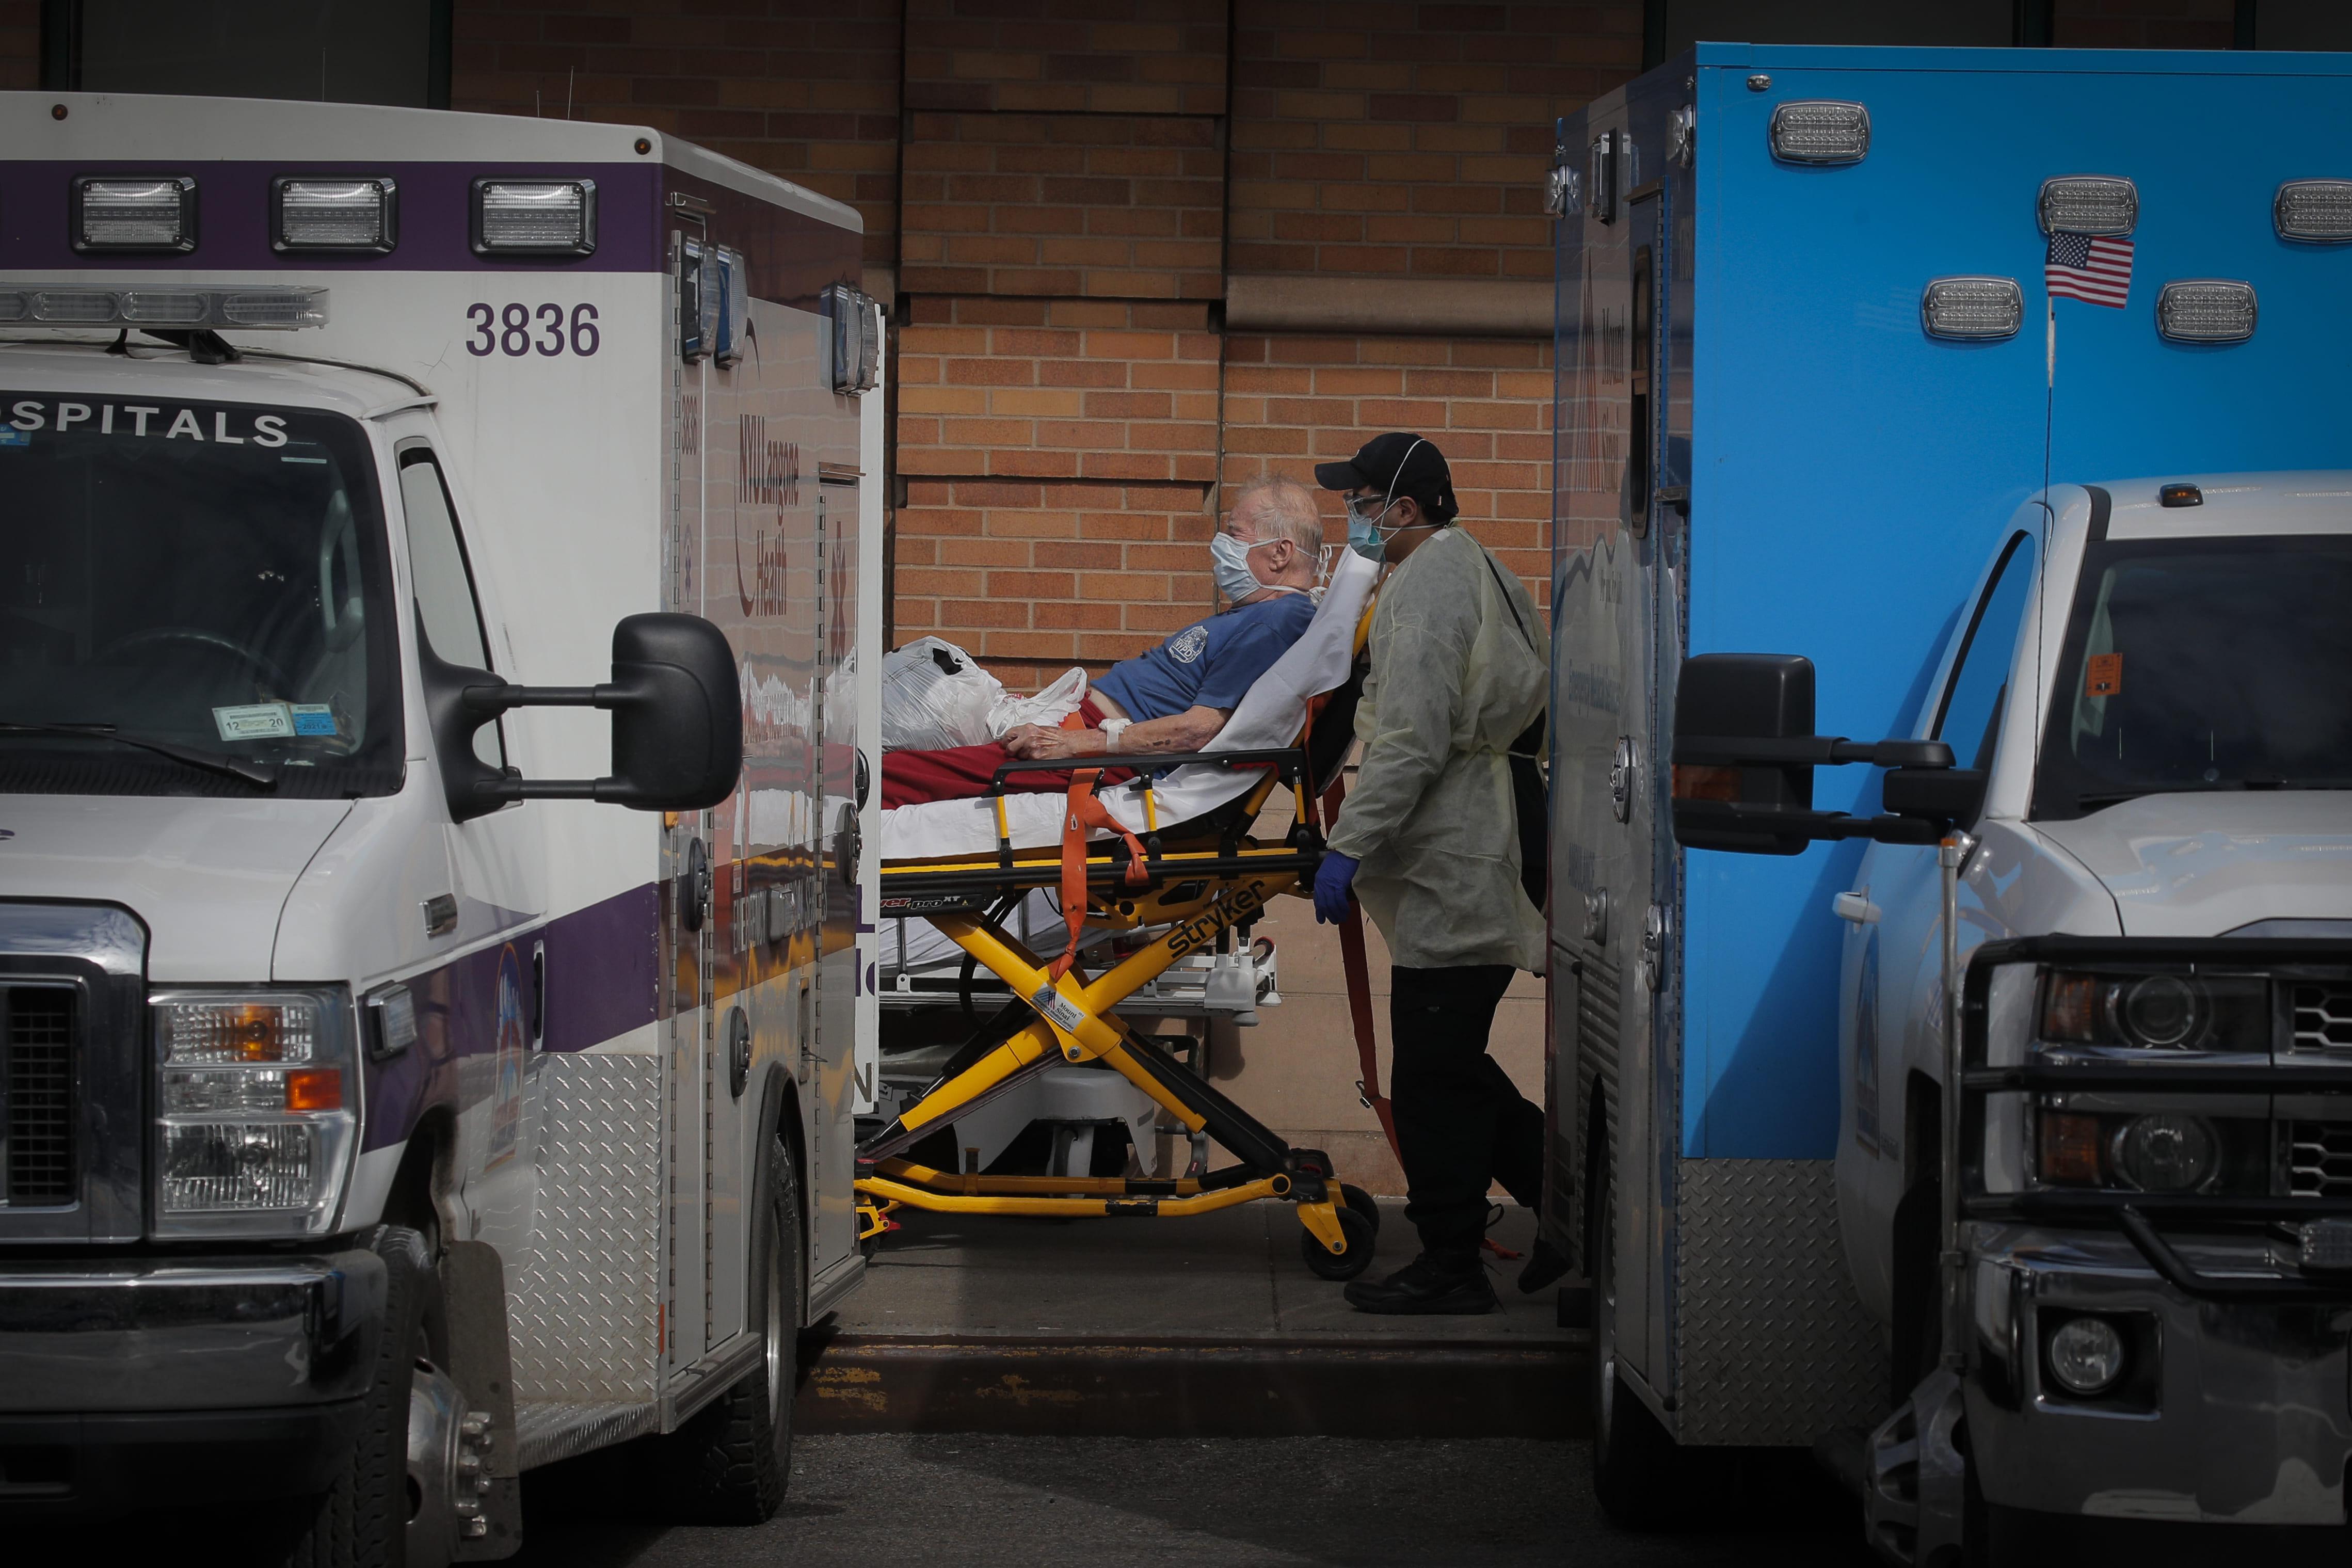 HEALTH-CORONAVIRUS-USA-NEW-YORK__Reuters_Brendan Mcdermid_07_04_2020